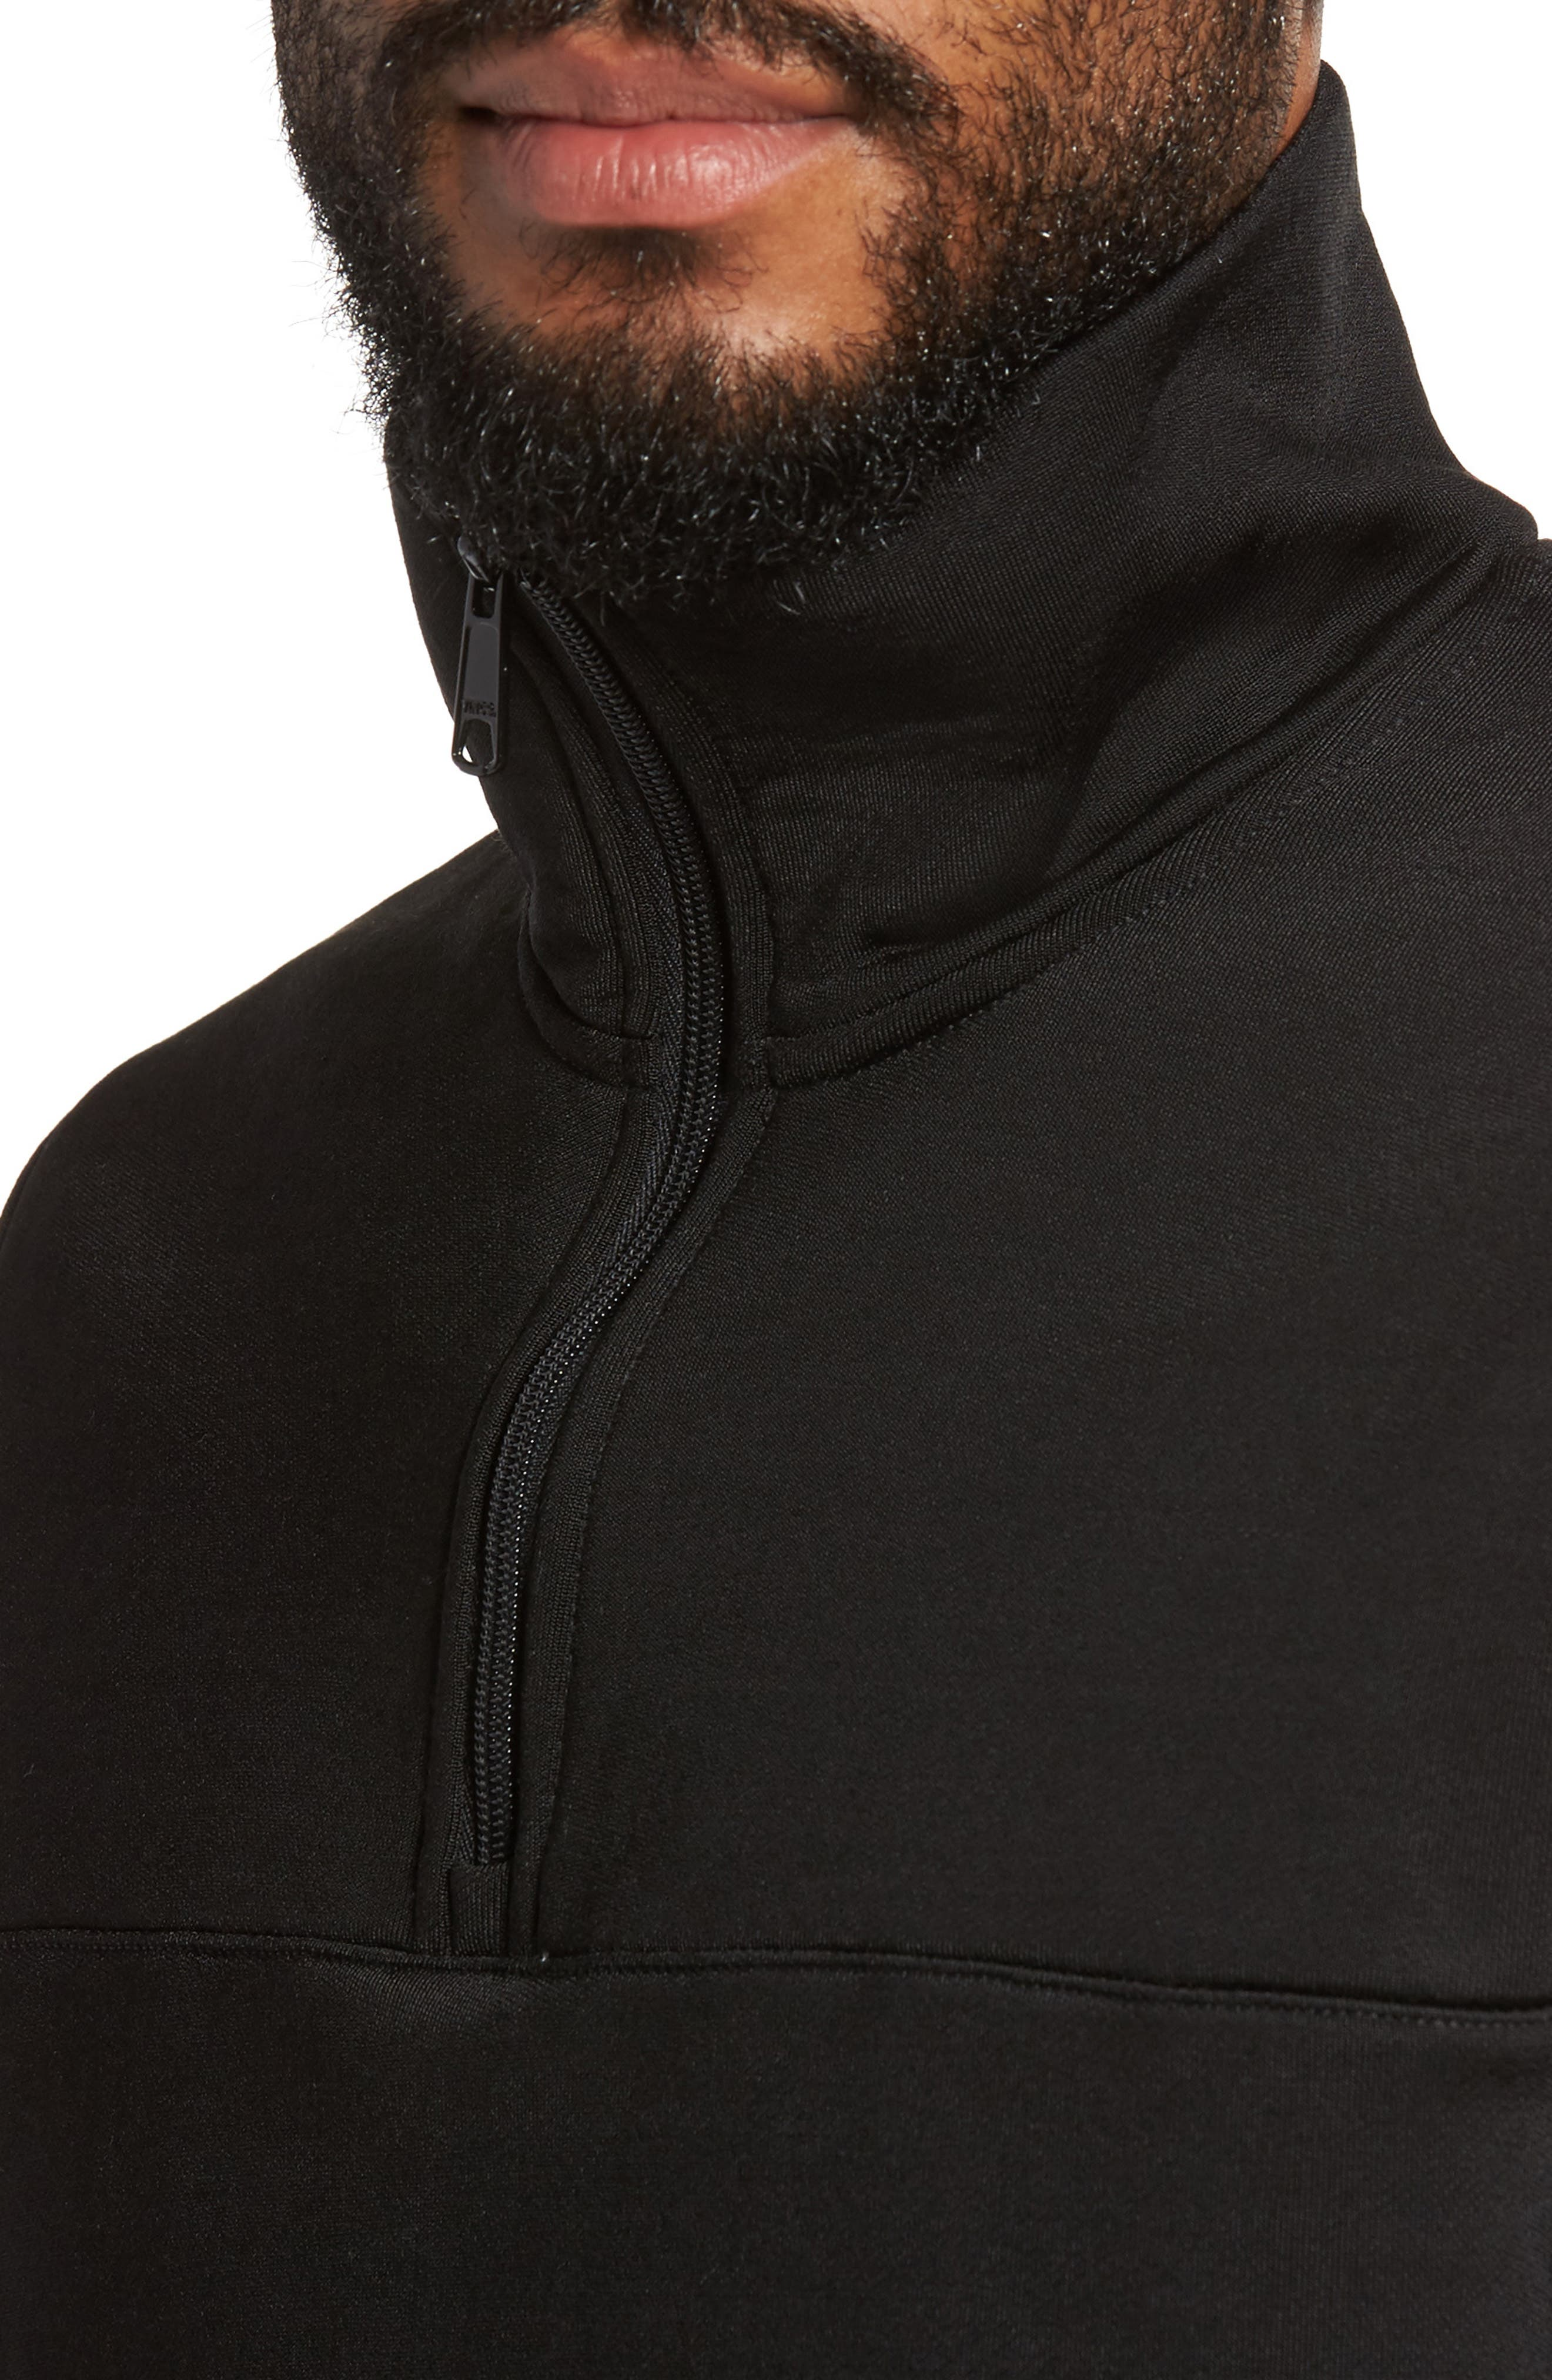 Quarter Zip Pullover,                             Alternate thumbnail 4, color,                             Black